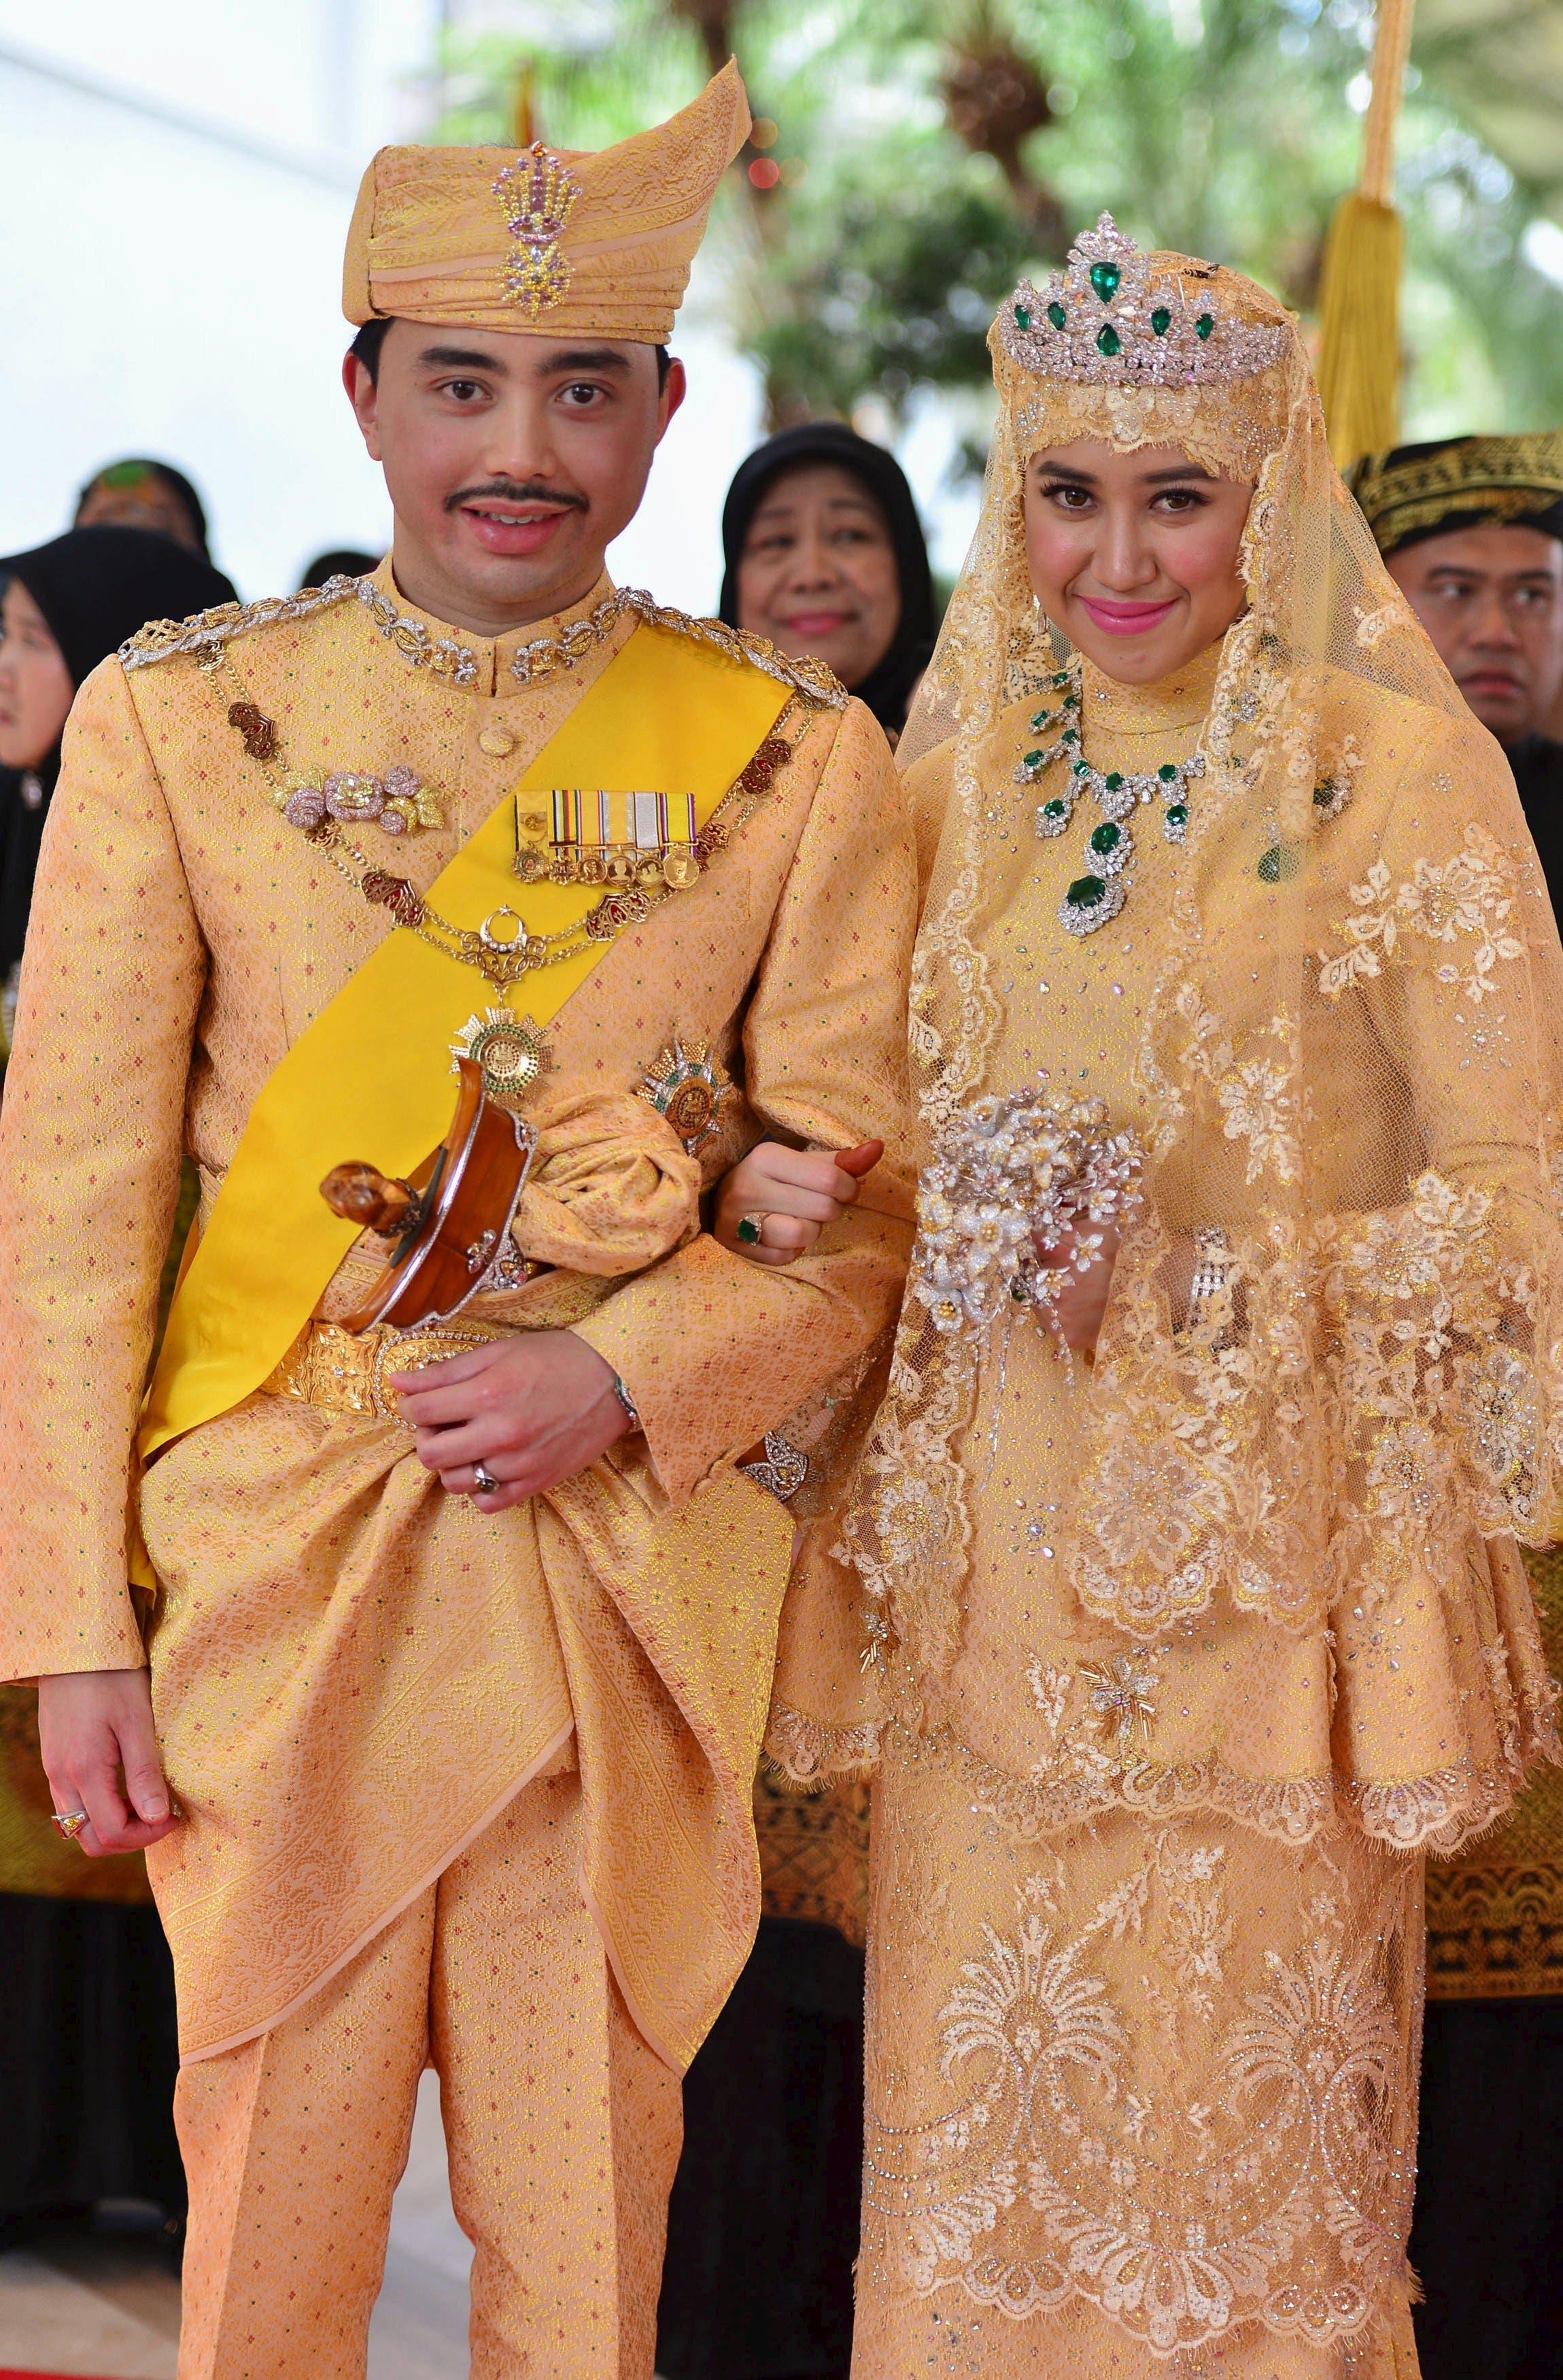 Brunei's newly wed royal couple, Prince Abdul Malik and Dayangku Raabi'atul 'Adawiyyah Pengiran Haji Bolkiah, pose for photographers at the Nurul Iman Palace in Bandar Seri Begawan April 12, 2015 (Reuters)